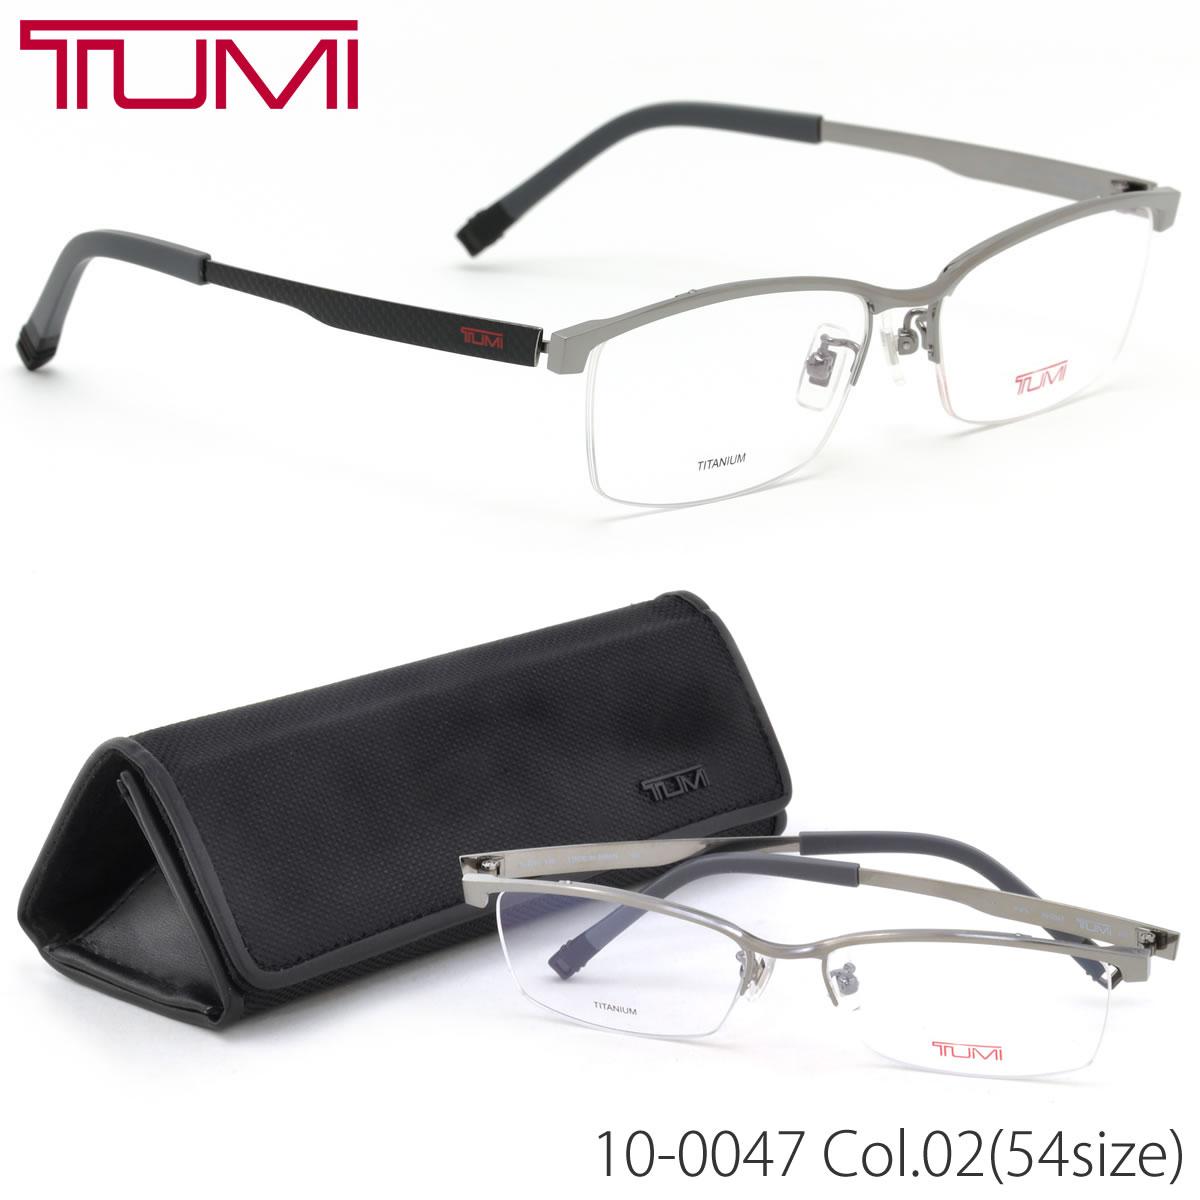 【TUMI】(トゥミ) メガネ フレーム 10-0047 02 54サイズ バリスティックコレクション スクエア チタン フルリム トゥミ TUMI メンズ レディース